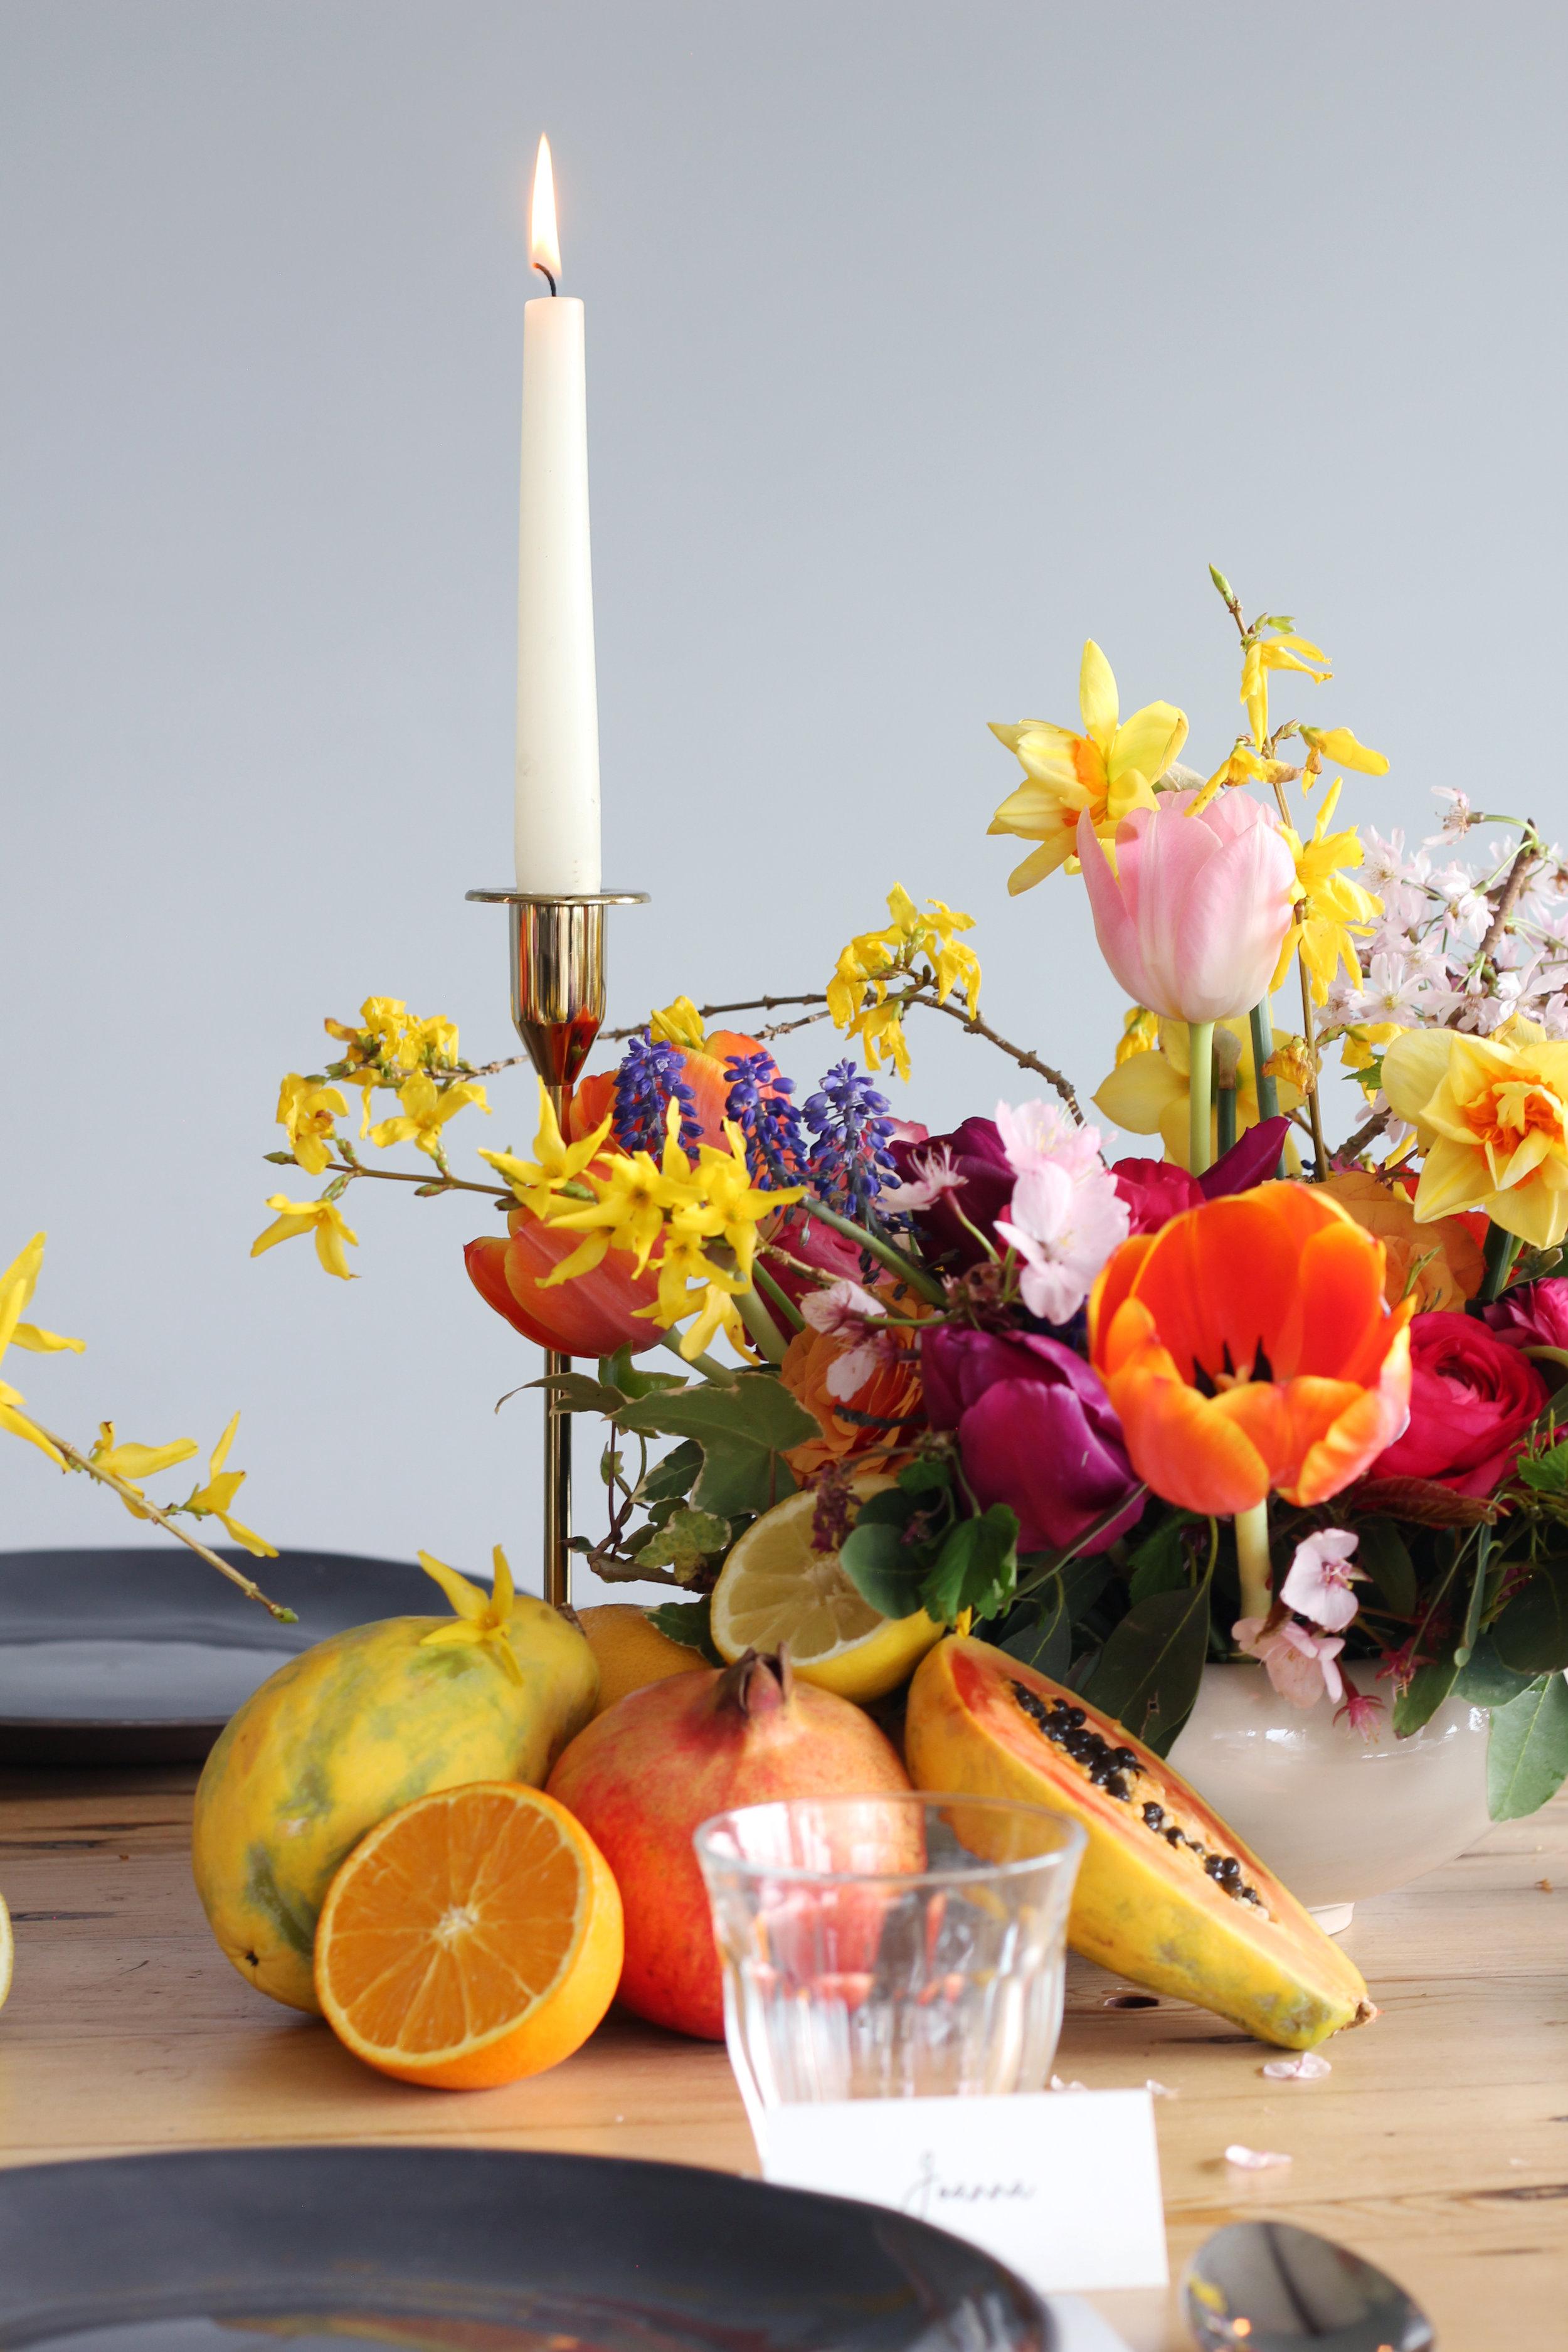 Callie-Pettigrew-Fruity-Florals-19.jpg